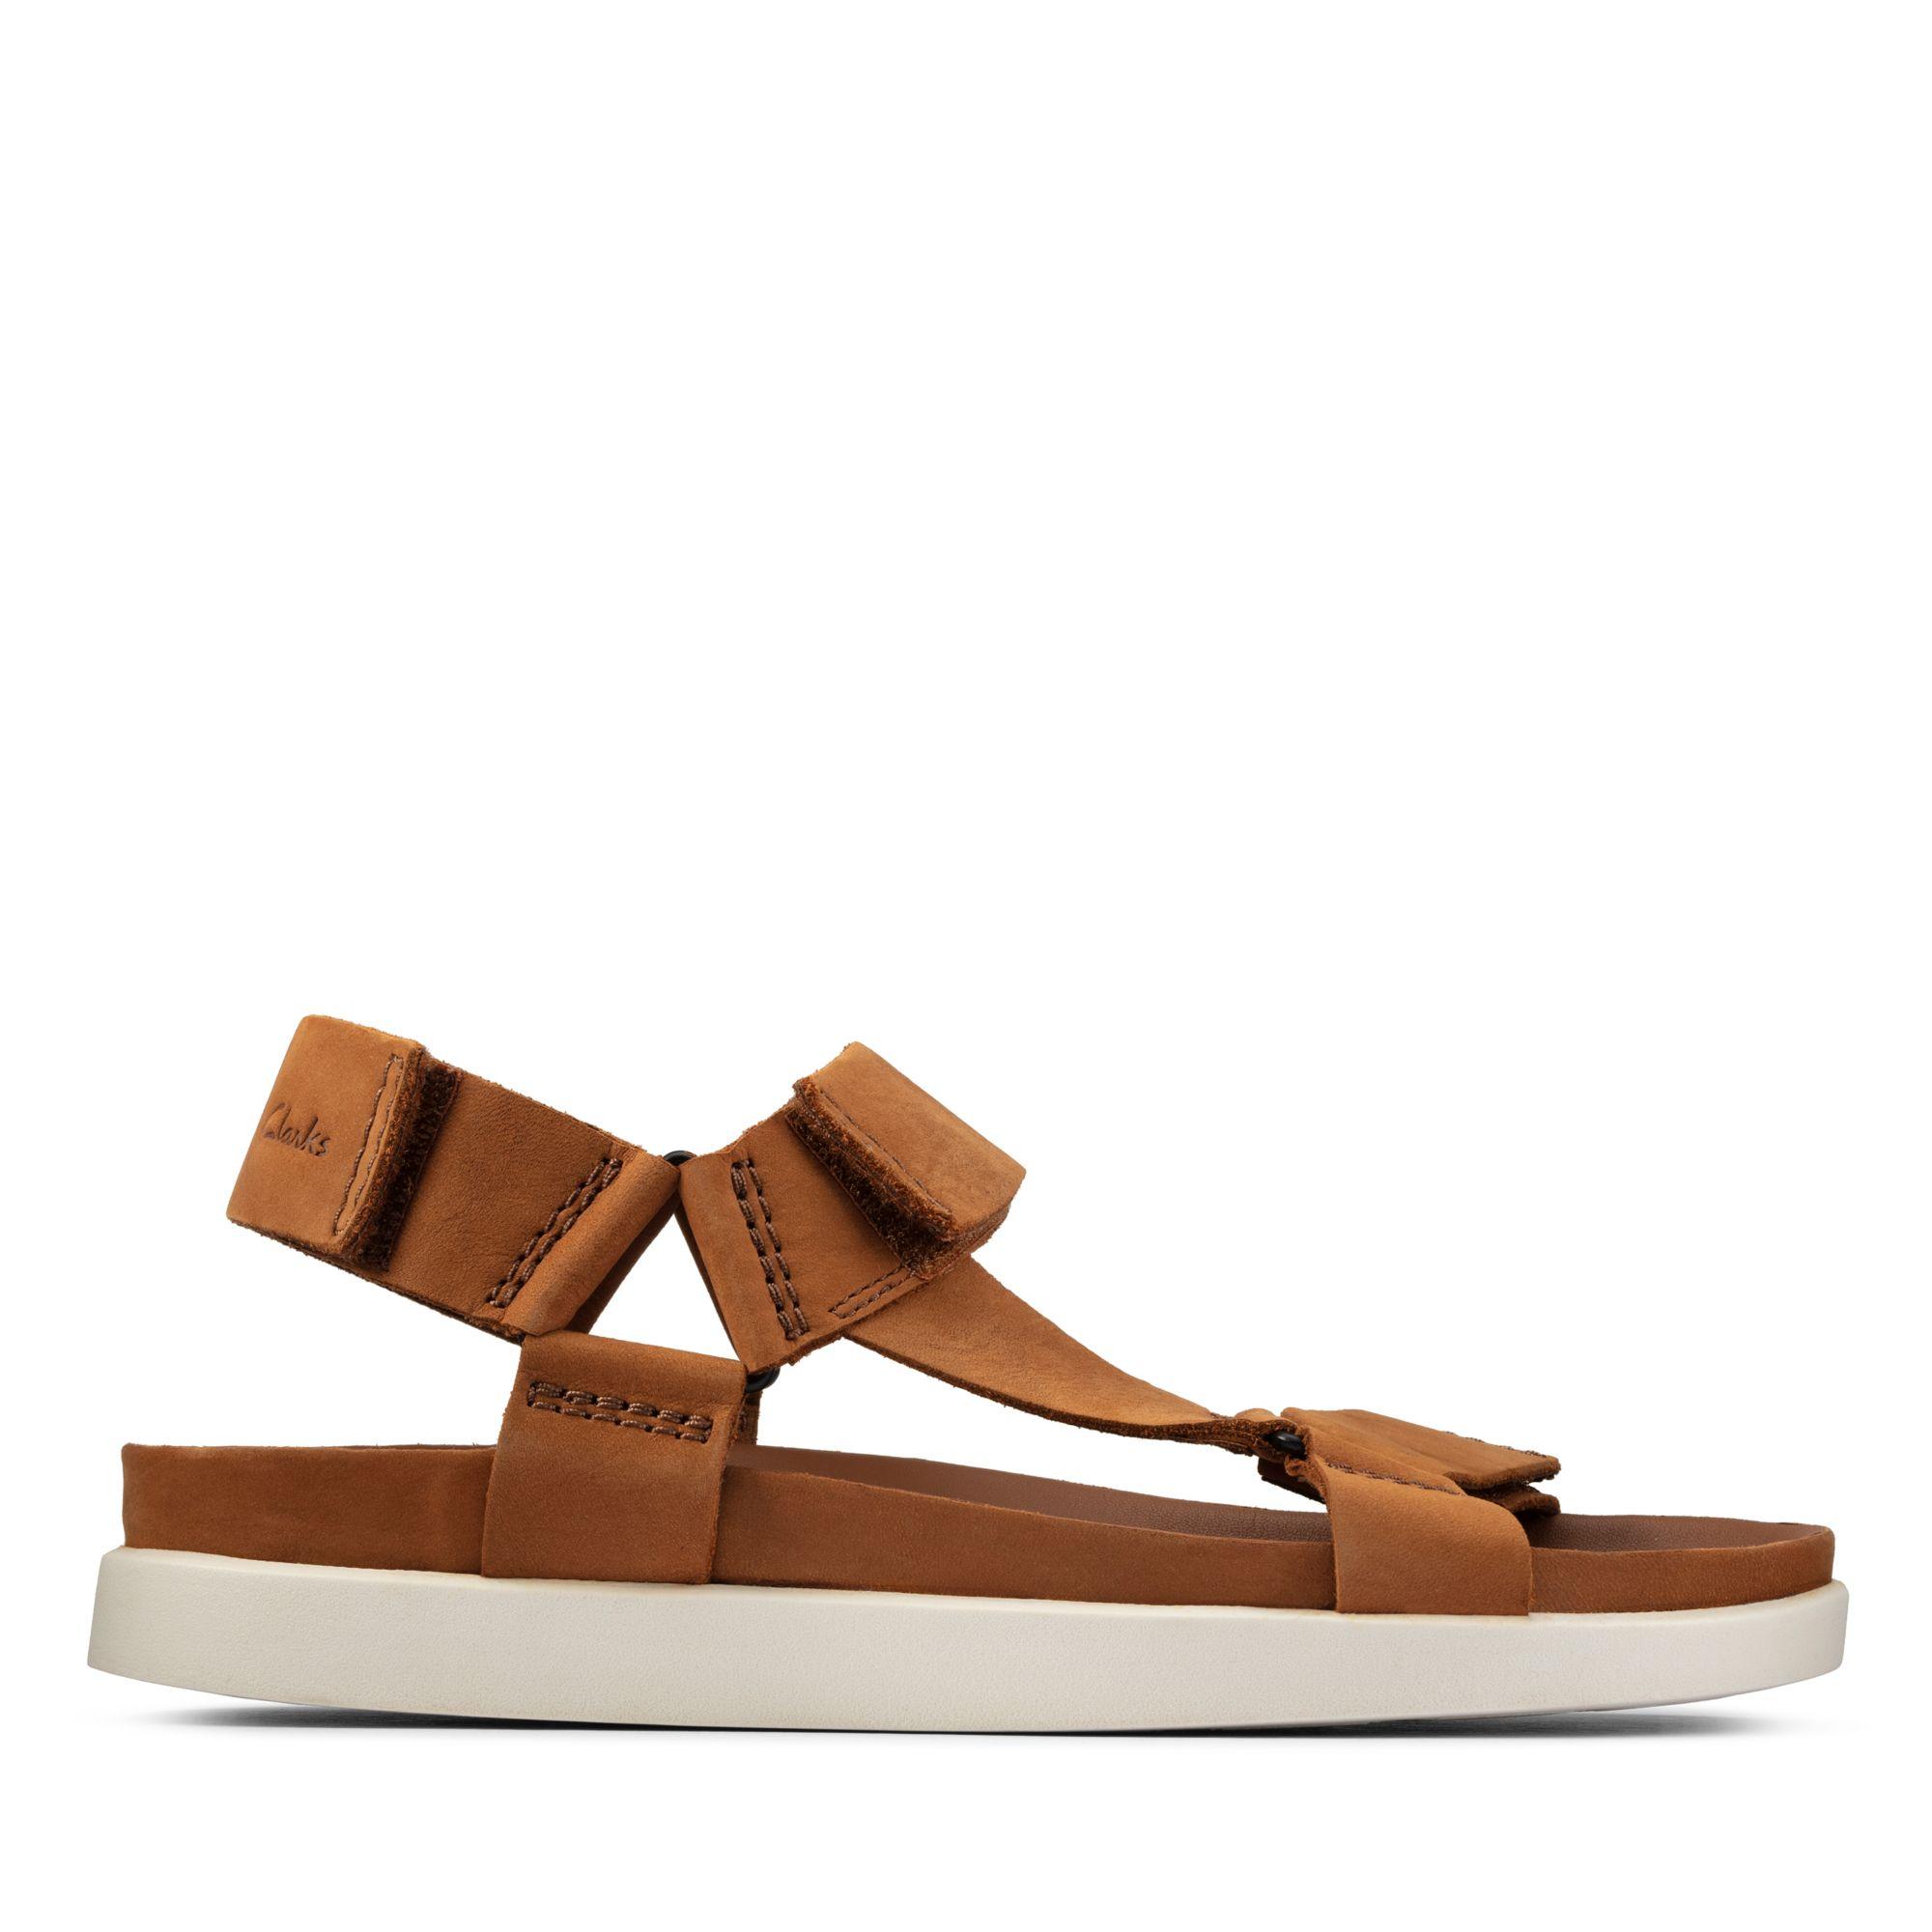 Clarks夏日街頭-Sunder Range輕量運動風涼鞋(棕褐色)